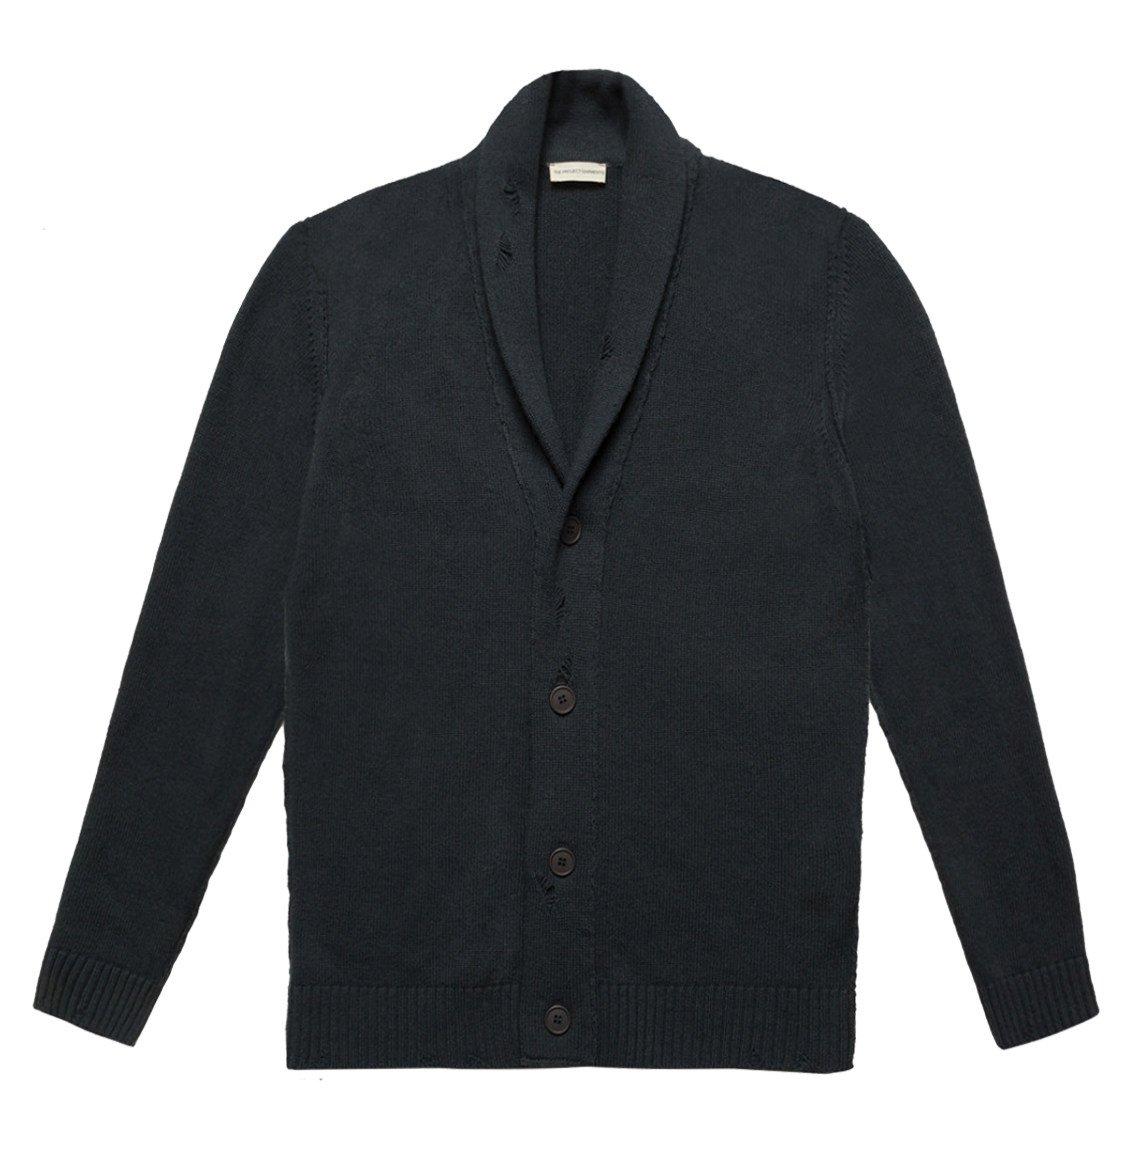 The Project Garments Shawl Collar Distressed Cardigan Virgin Wool Grey